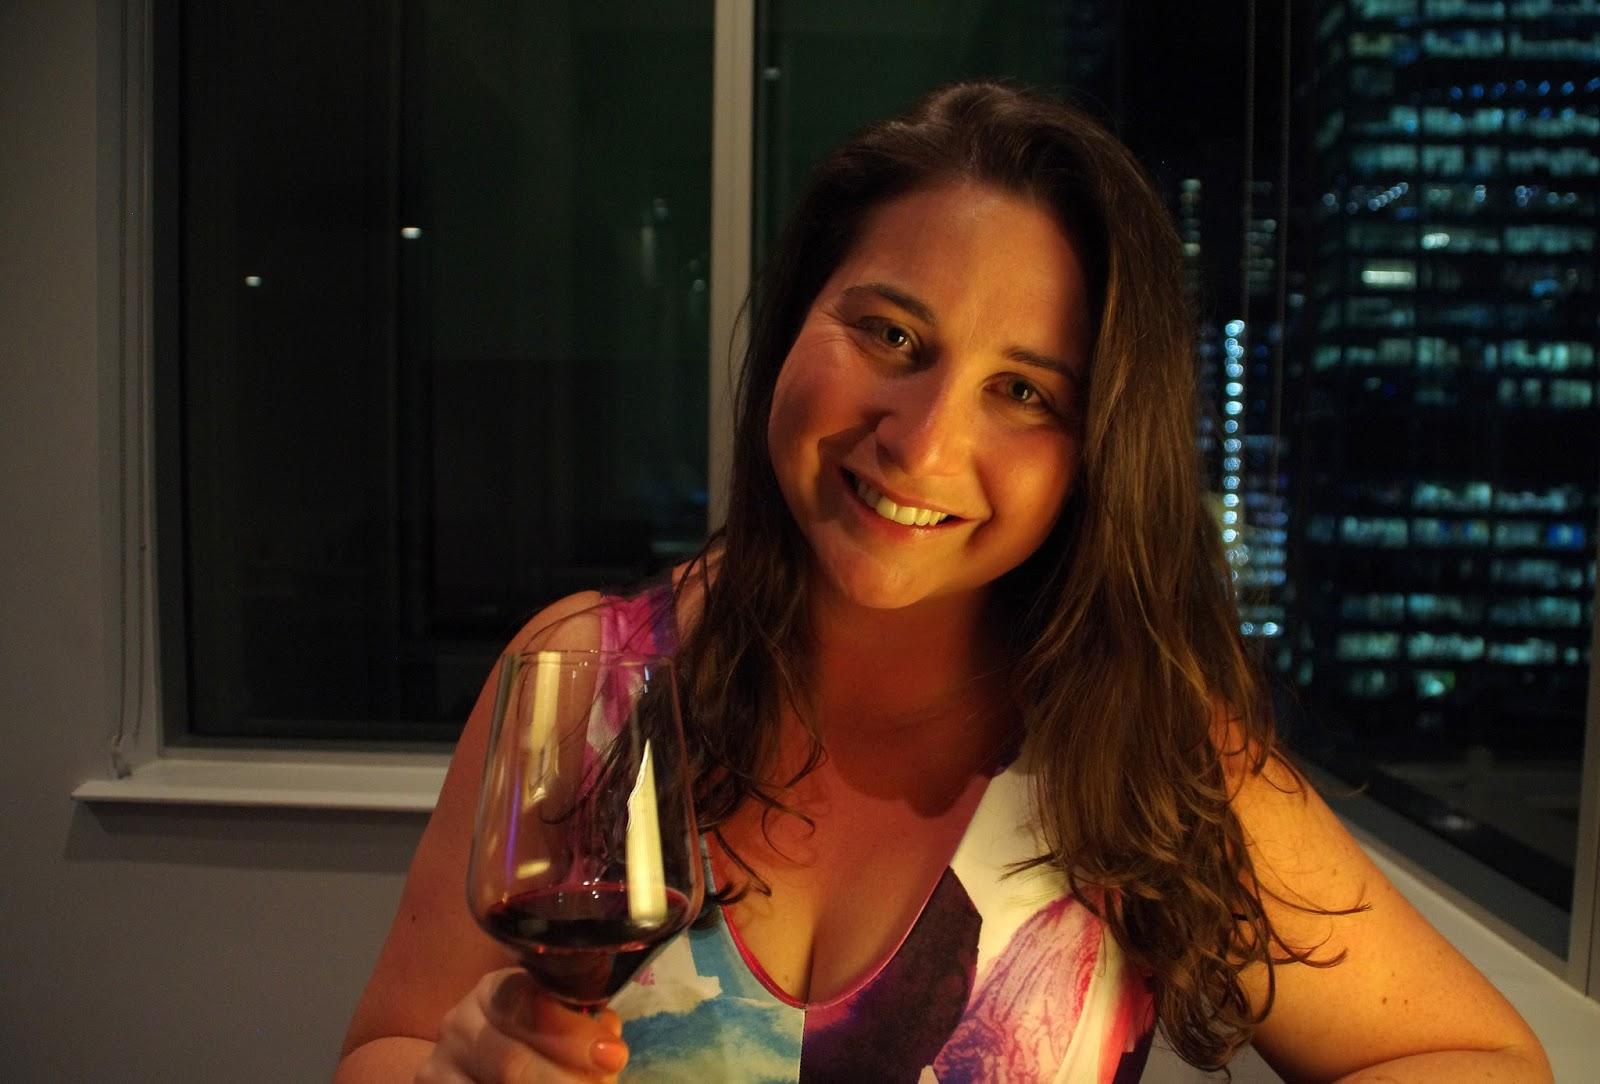 Simone having a glass of wine in Swissotel Executive lounge Sydney